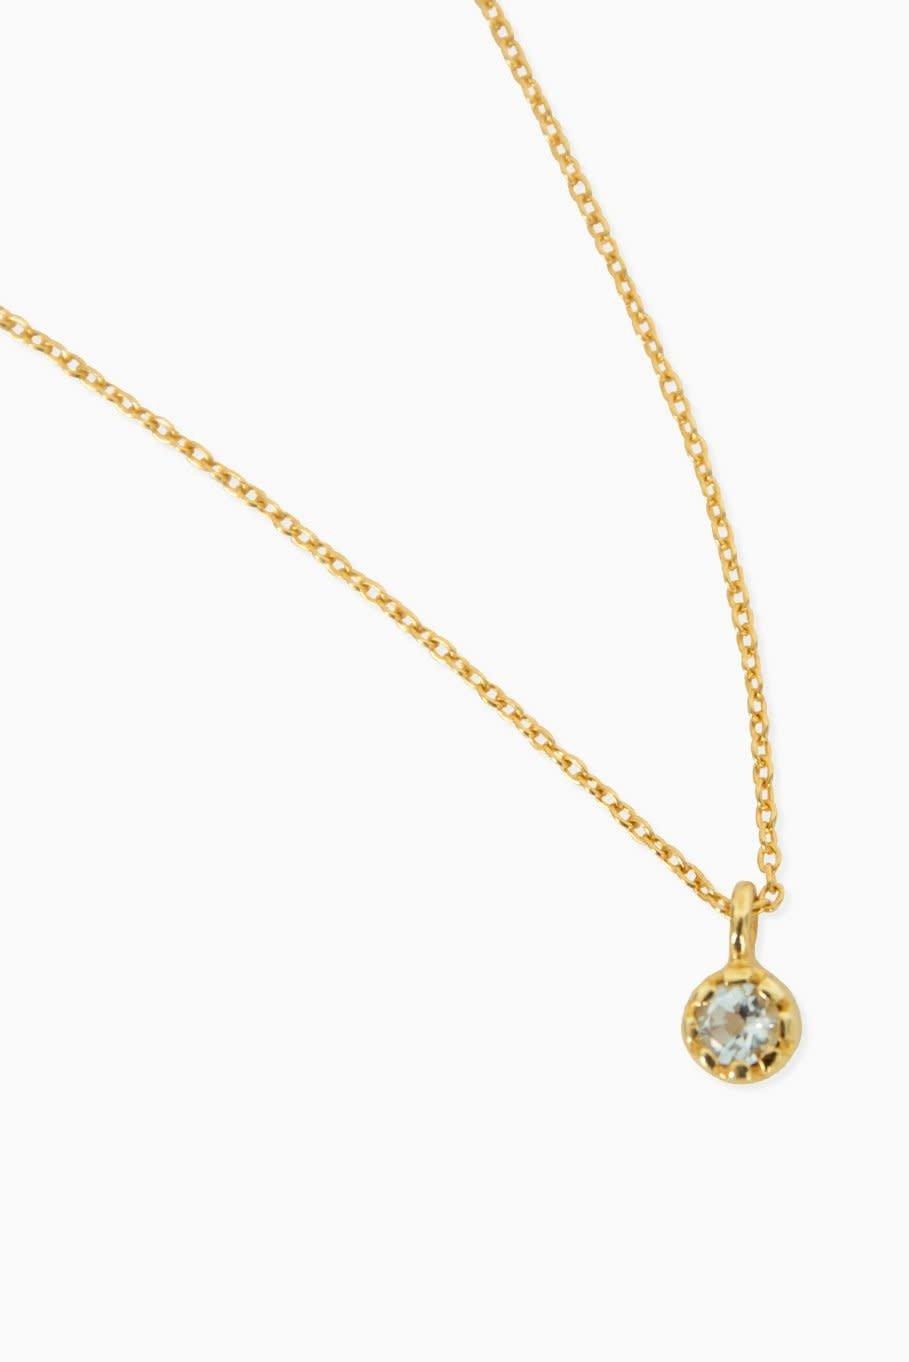 Détail Necklace Heike aqaumarine gold plated (8859)